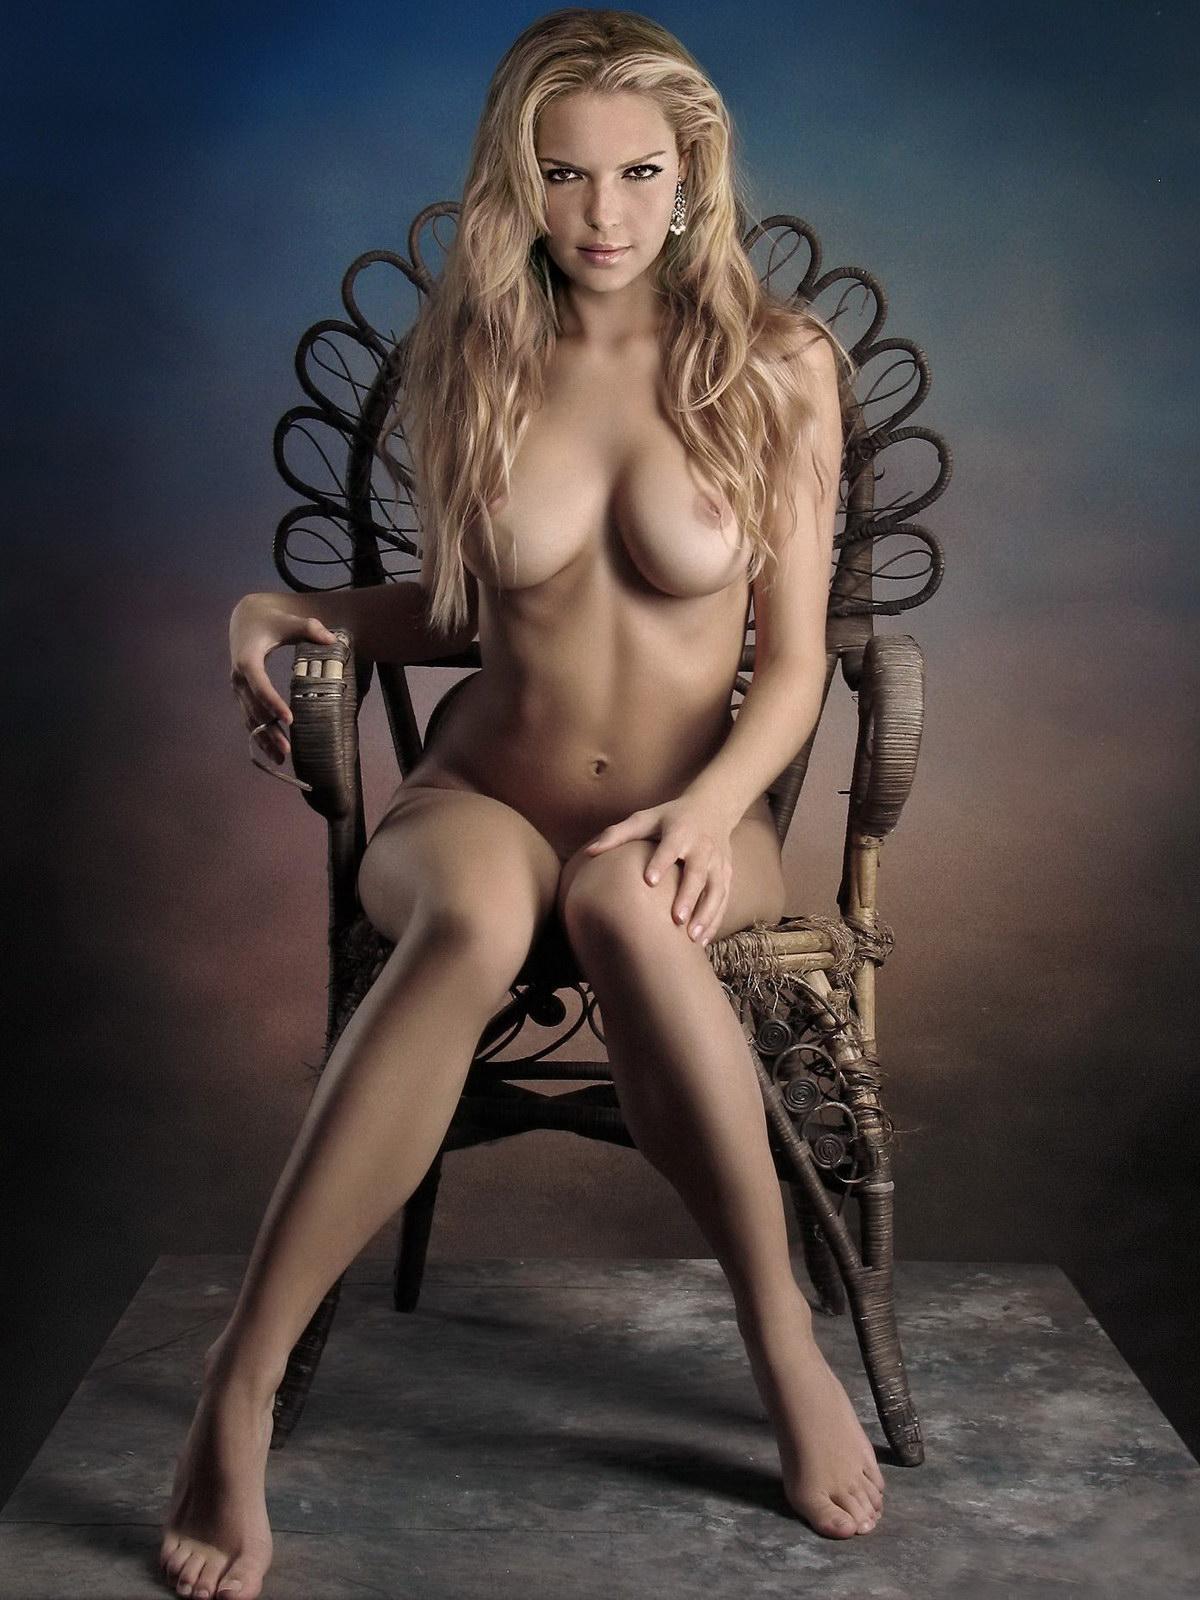 http://1.bp.blogspot.com/_NRGPIrDtEg8/TRRBnKtohOI/AAAAAAAAAg4/vDMT_LCHhbg/s1600/Katherine_Heigl_nude_big_tits_topless_2.jpg